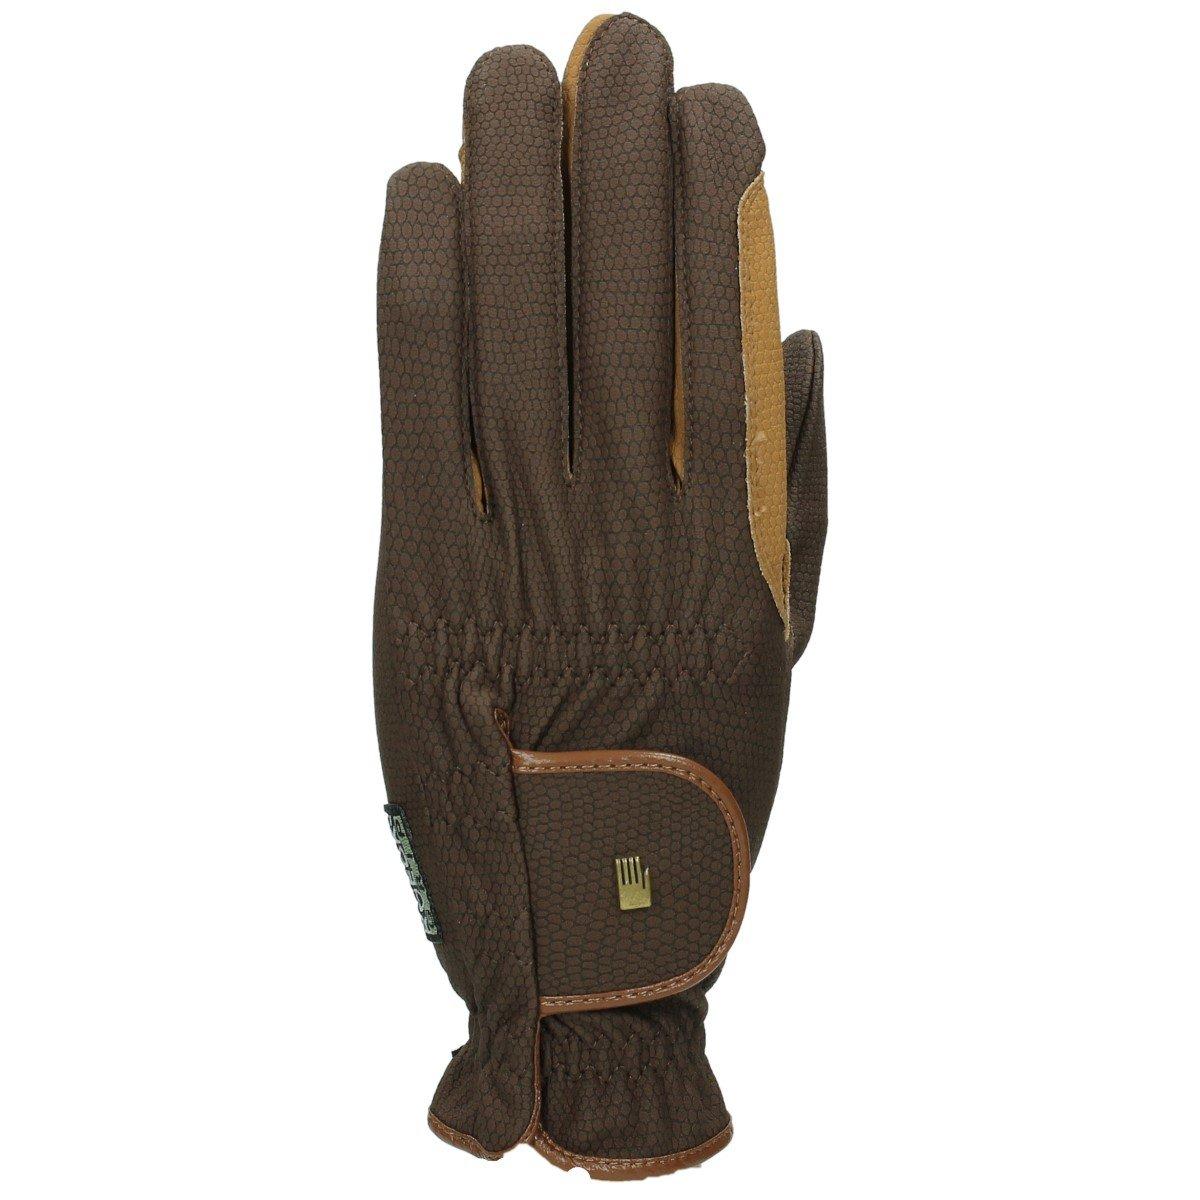 ROECKL Handschuhe Roeck grip -bicolour-, mokka/caramel, 7, 5 Roeckl sports